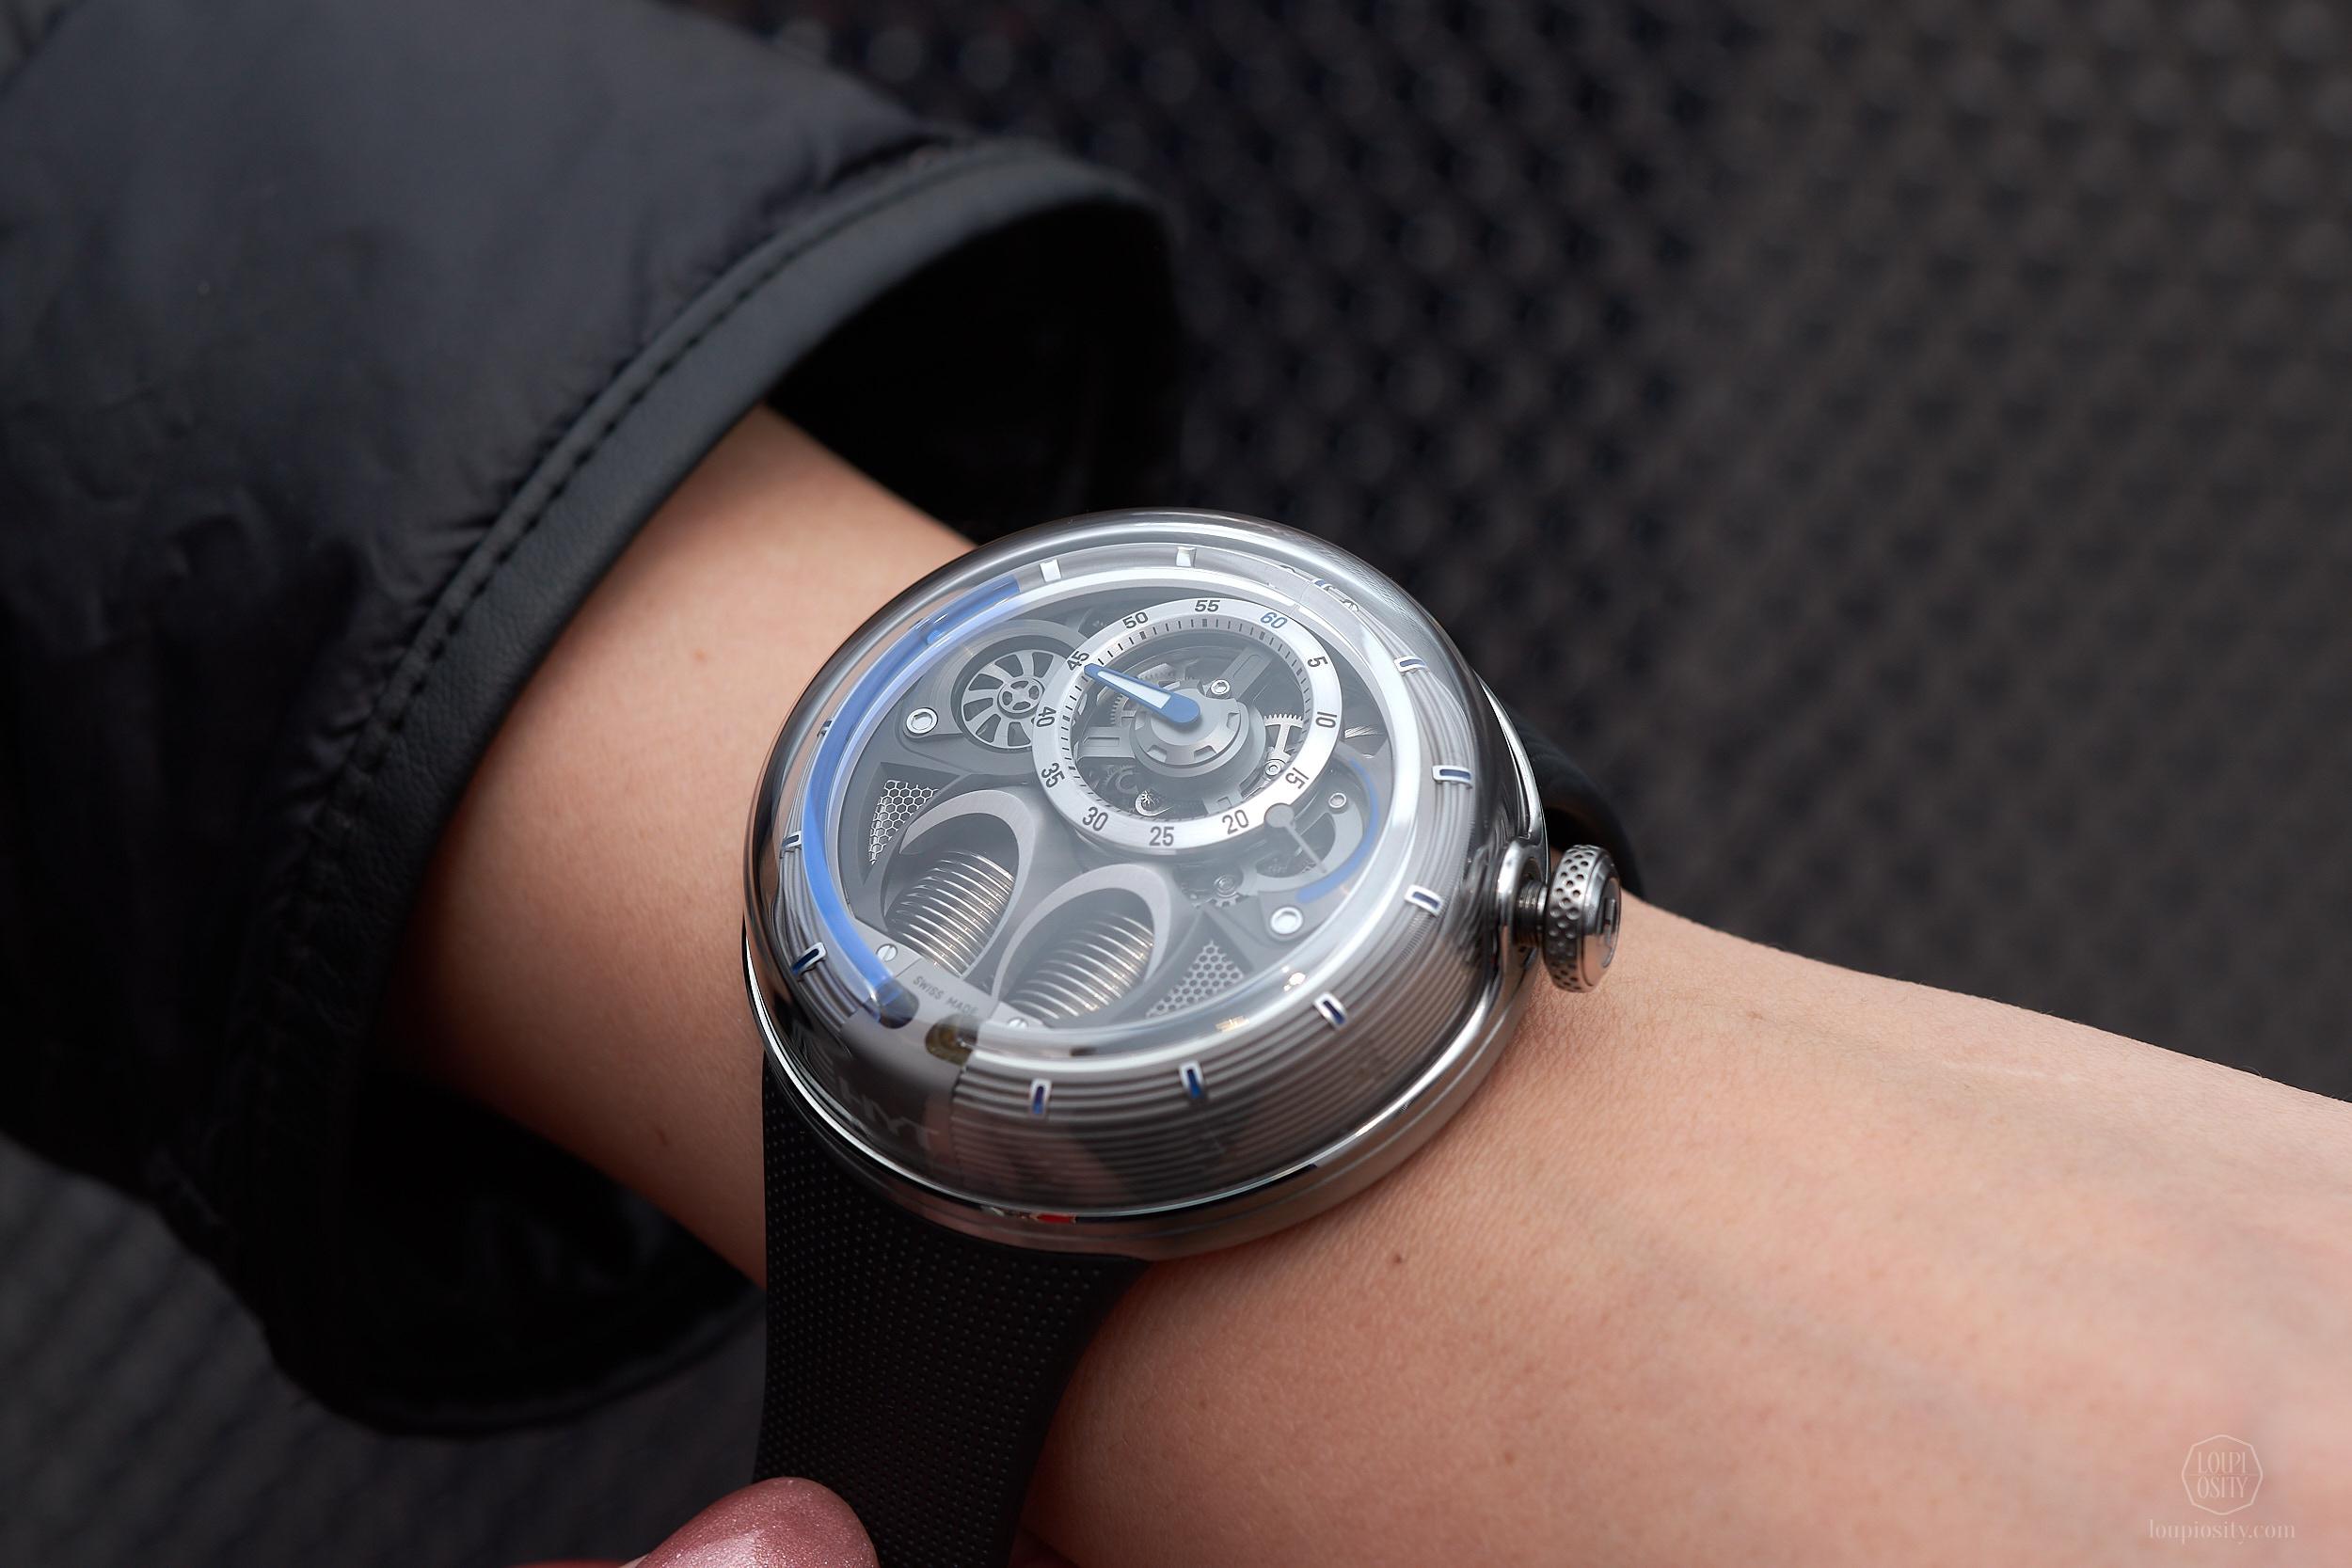 HYT 1.0 blue - on the wrist